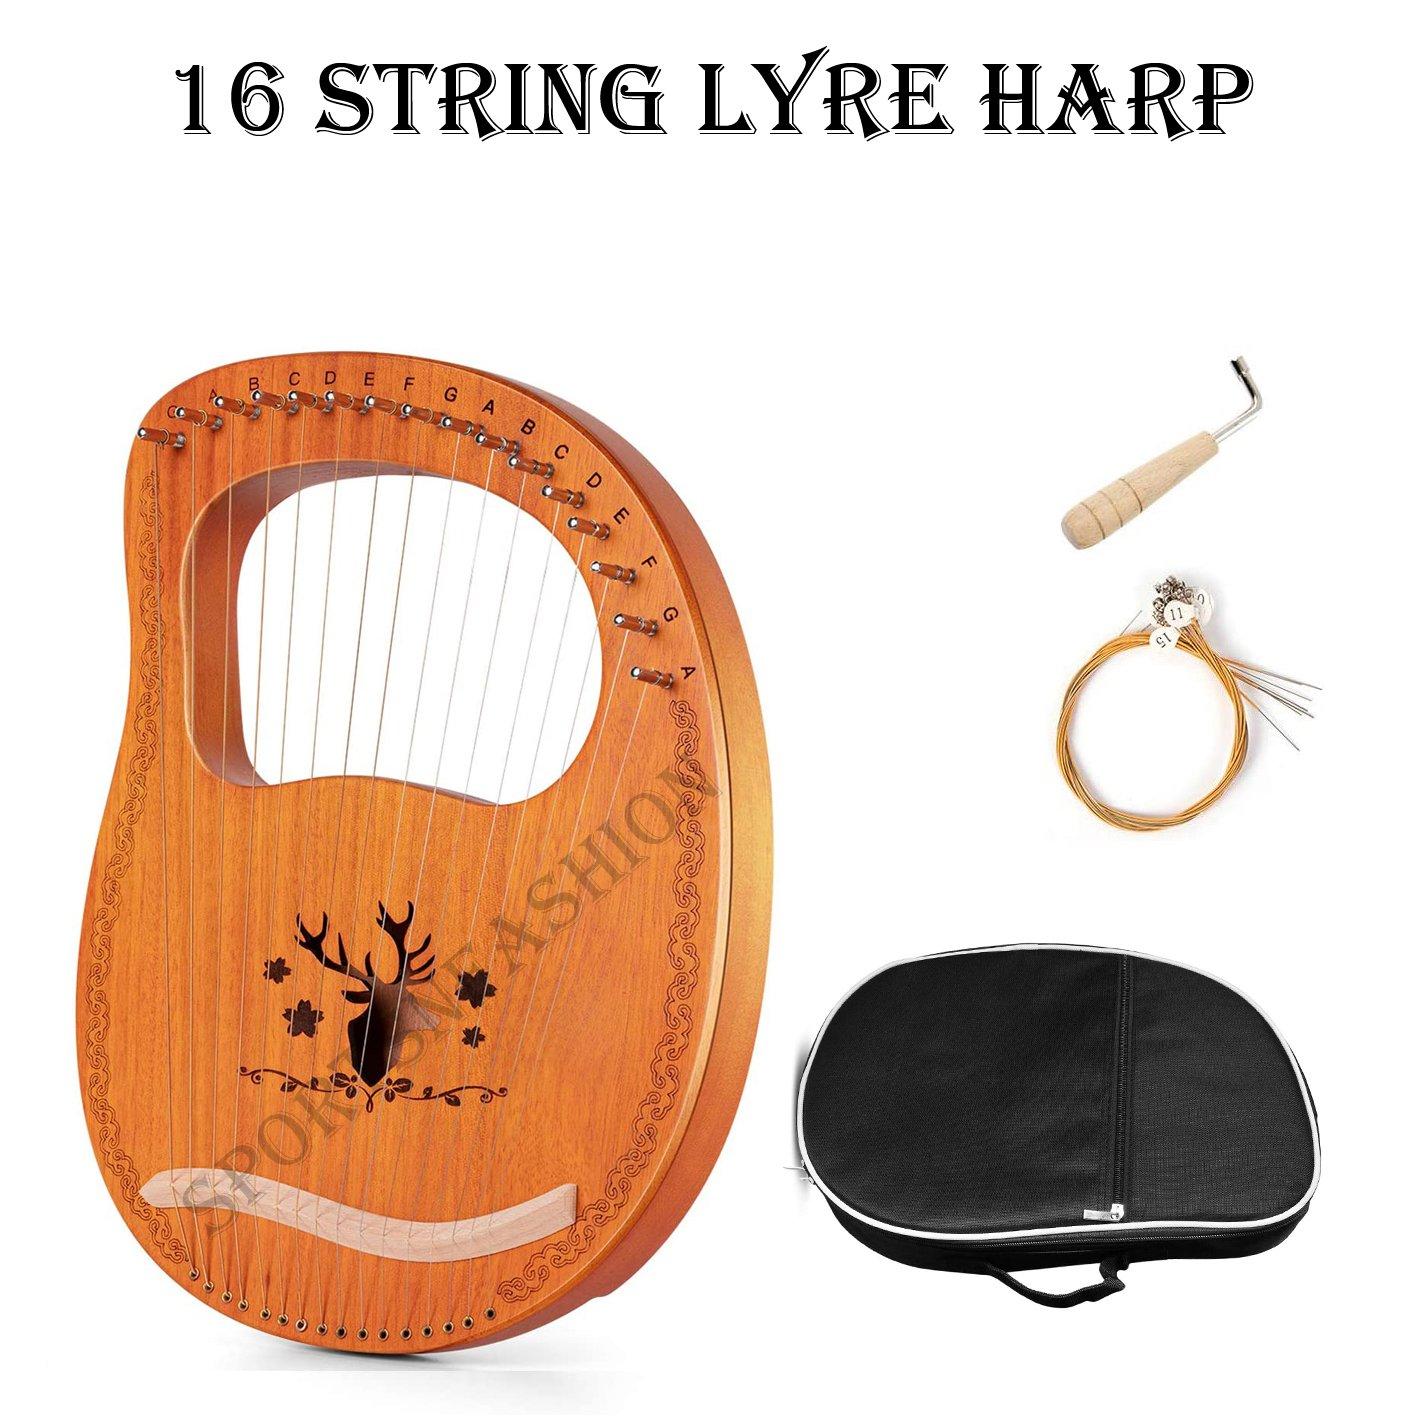 16 string Lyre Harp Mahogany Plywood Body String Instrument with Tuning key